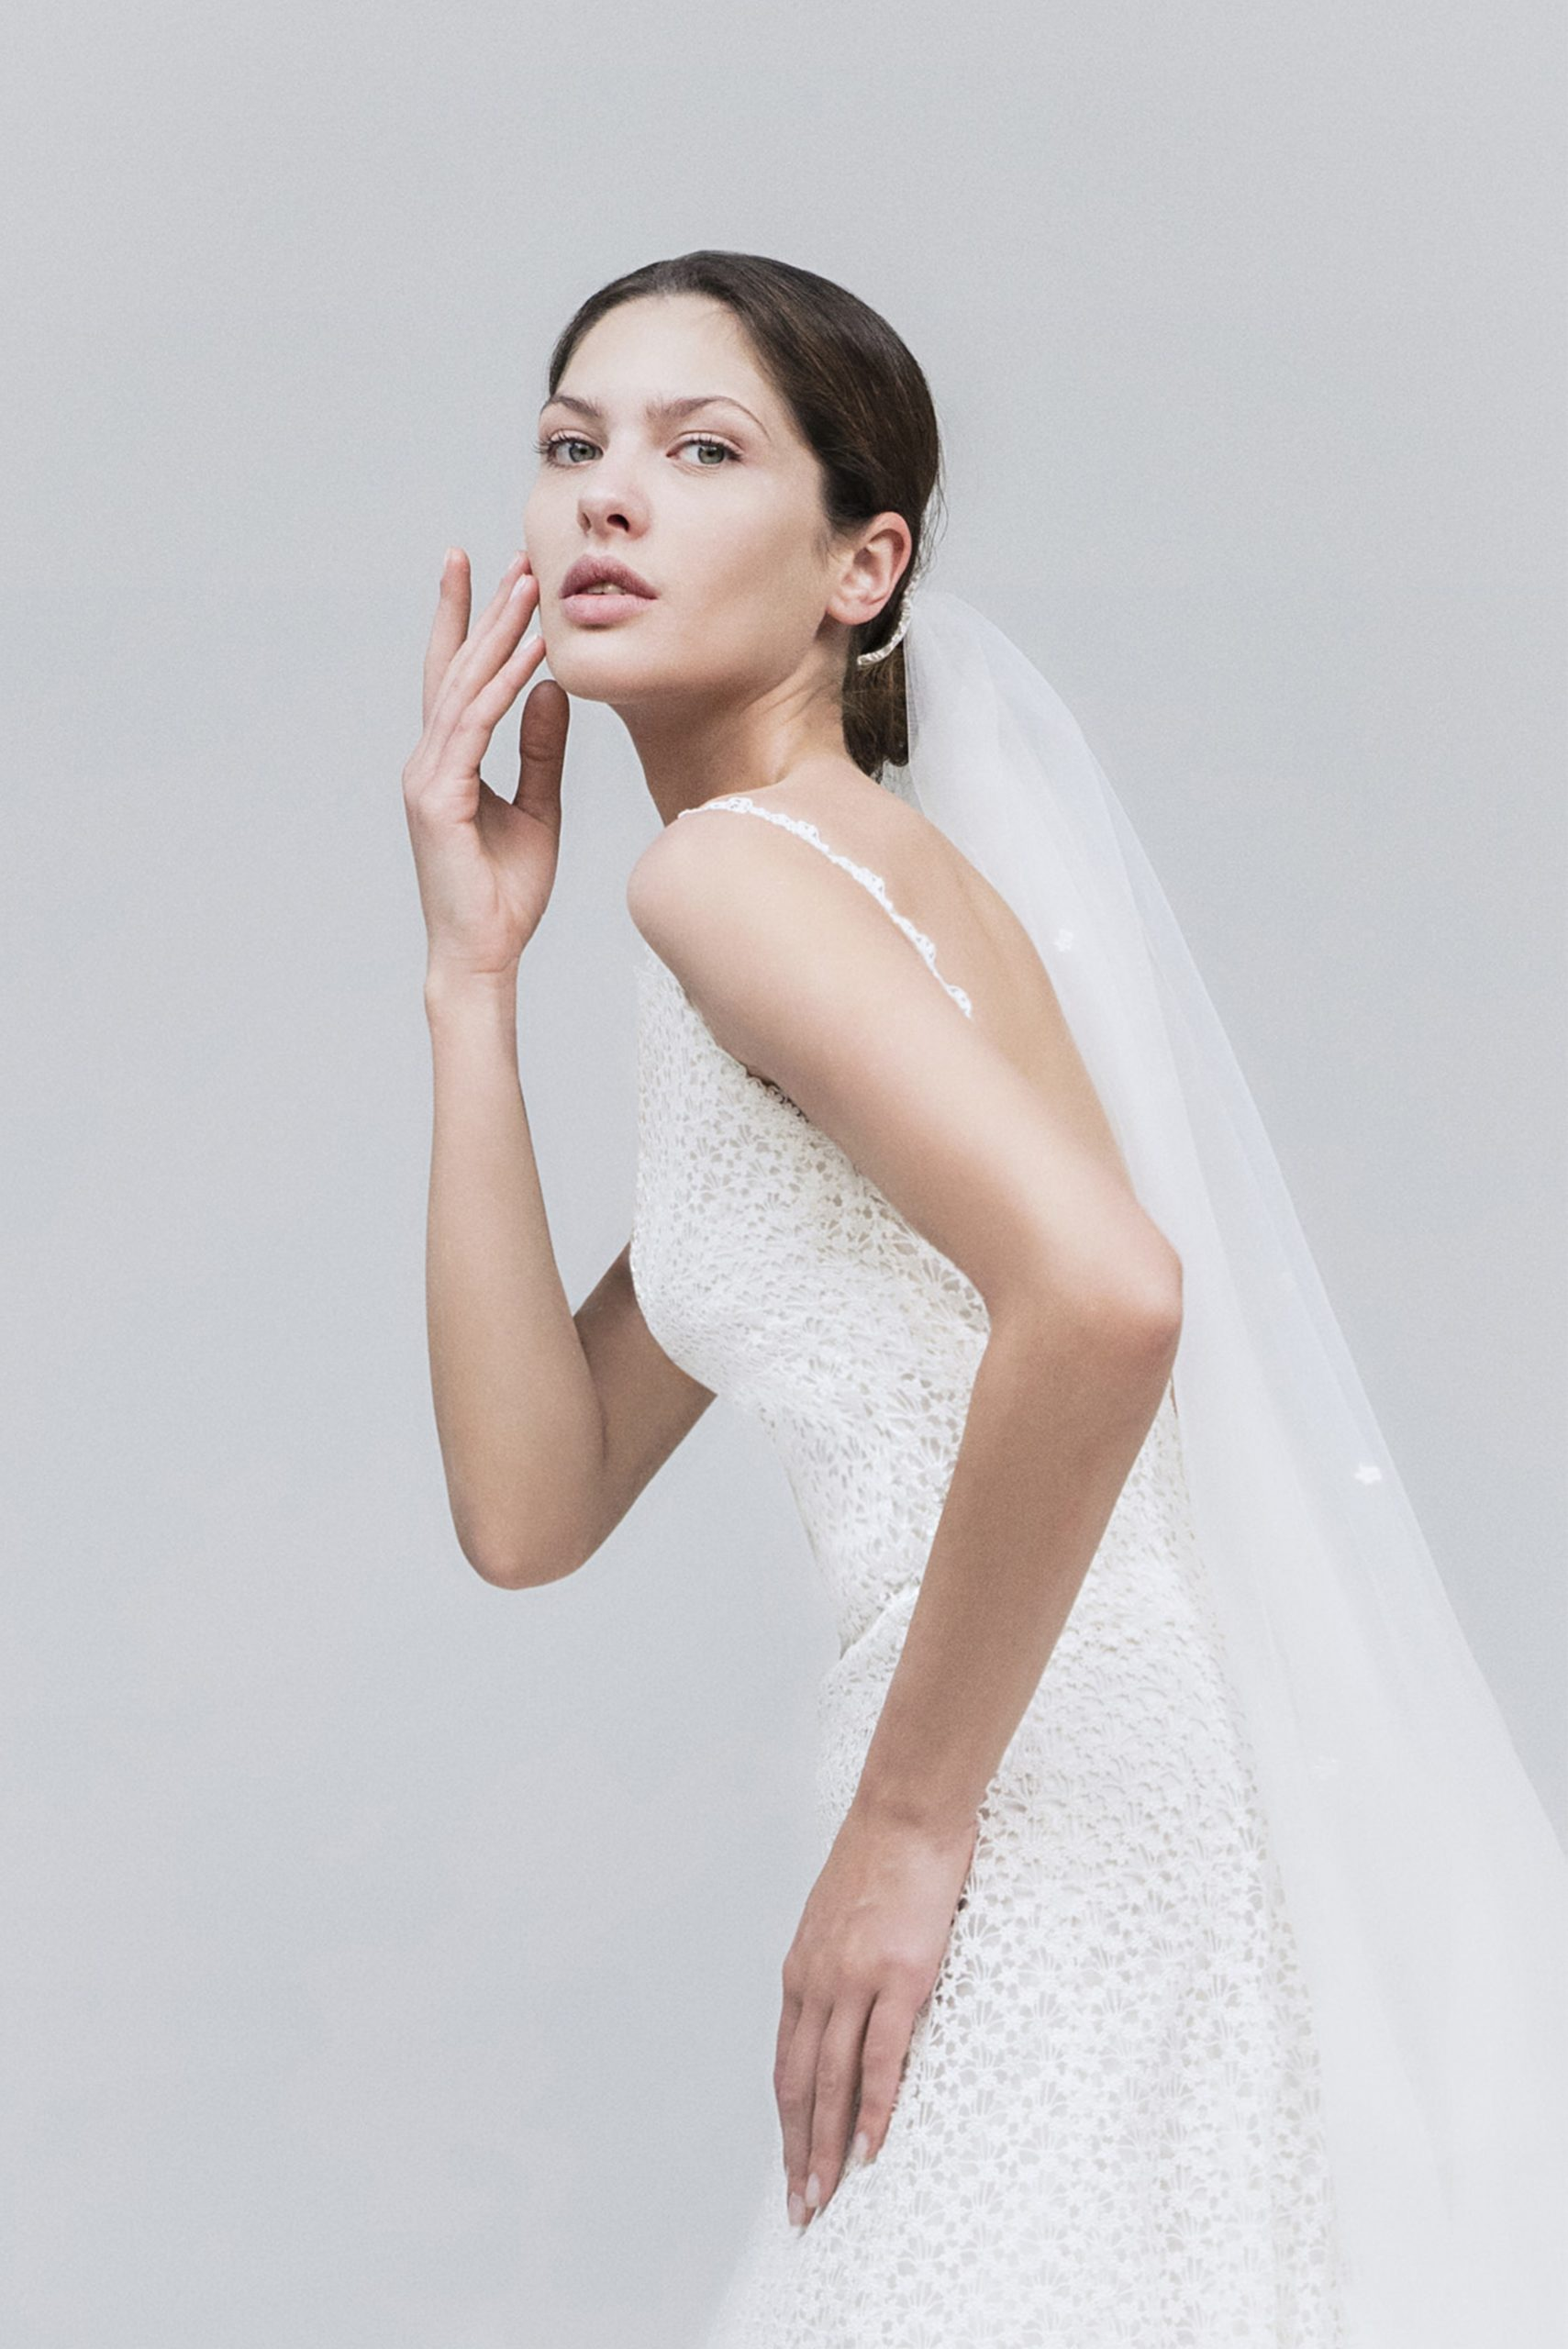 Annagemma Lascari Bride_ Look Veronica